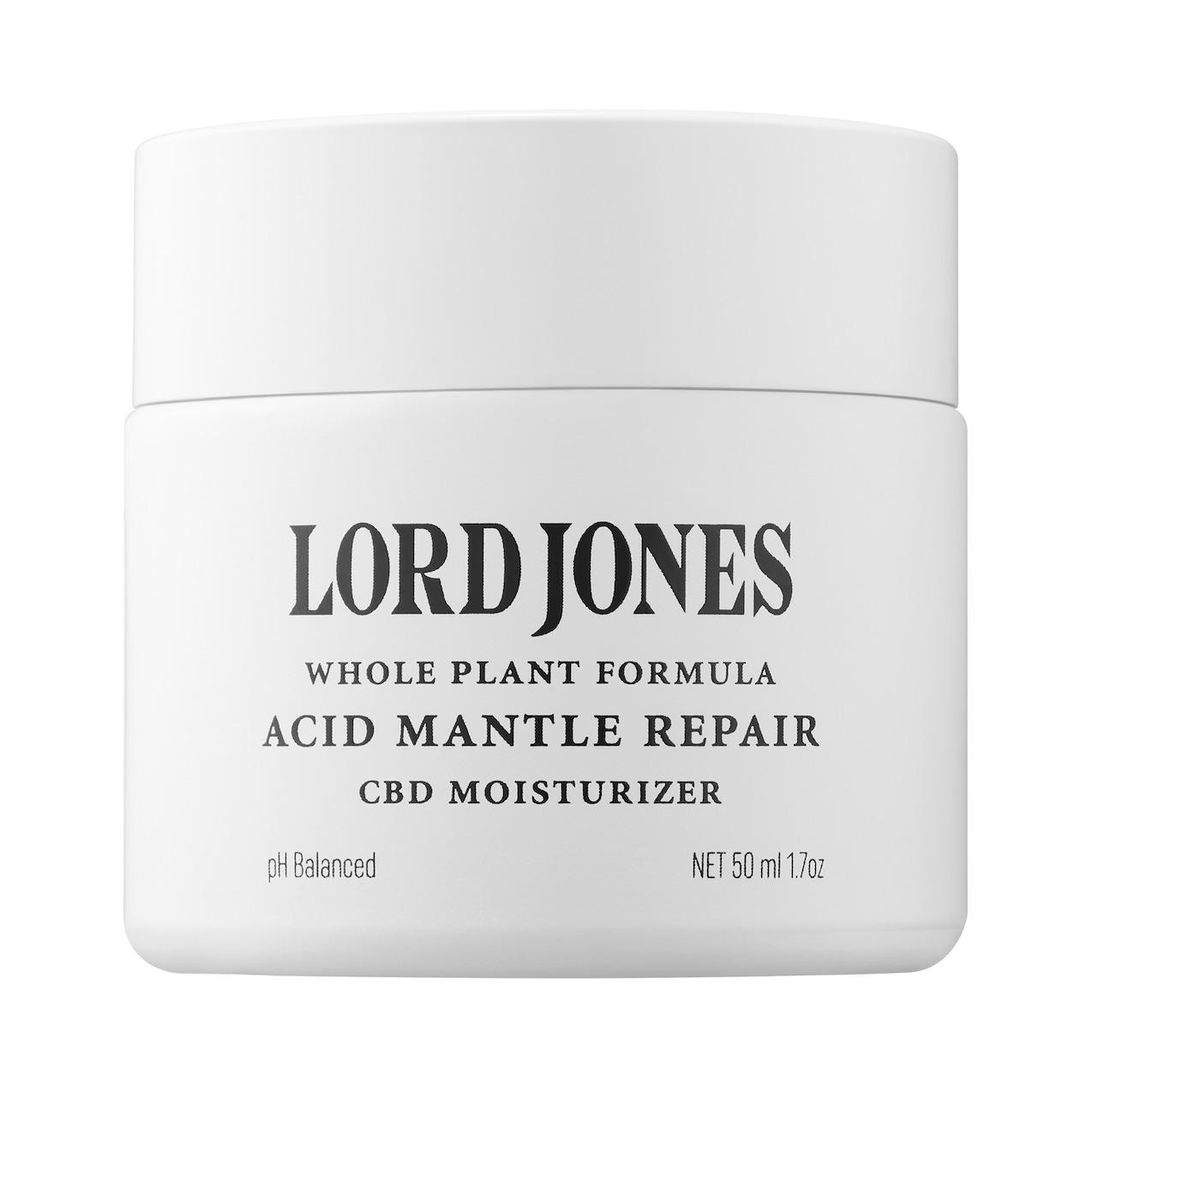 lord jones acid mantle repair moisturizer with 250mg cbd and ceramides